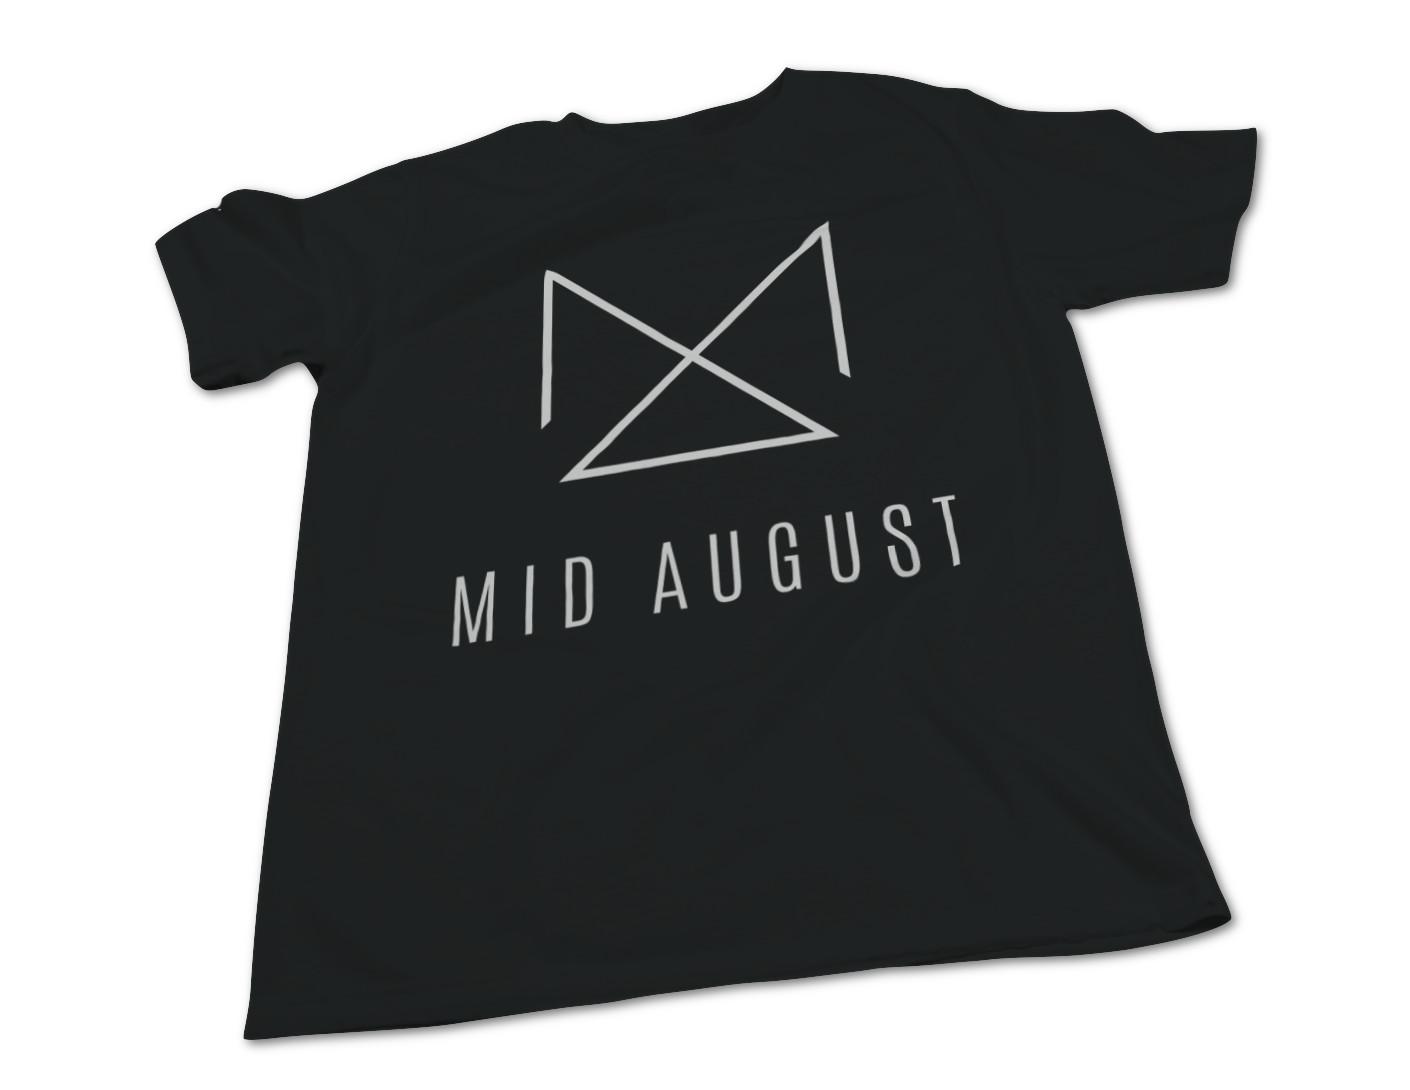 Mid august mid august logo 1492705889